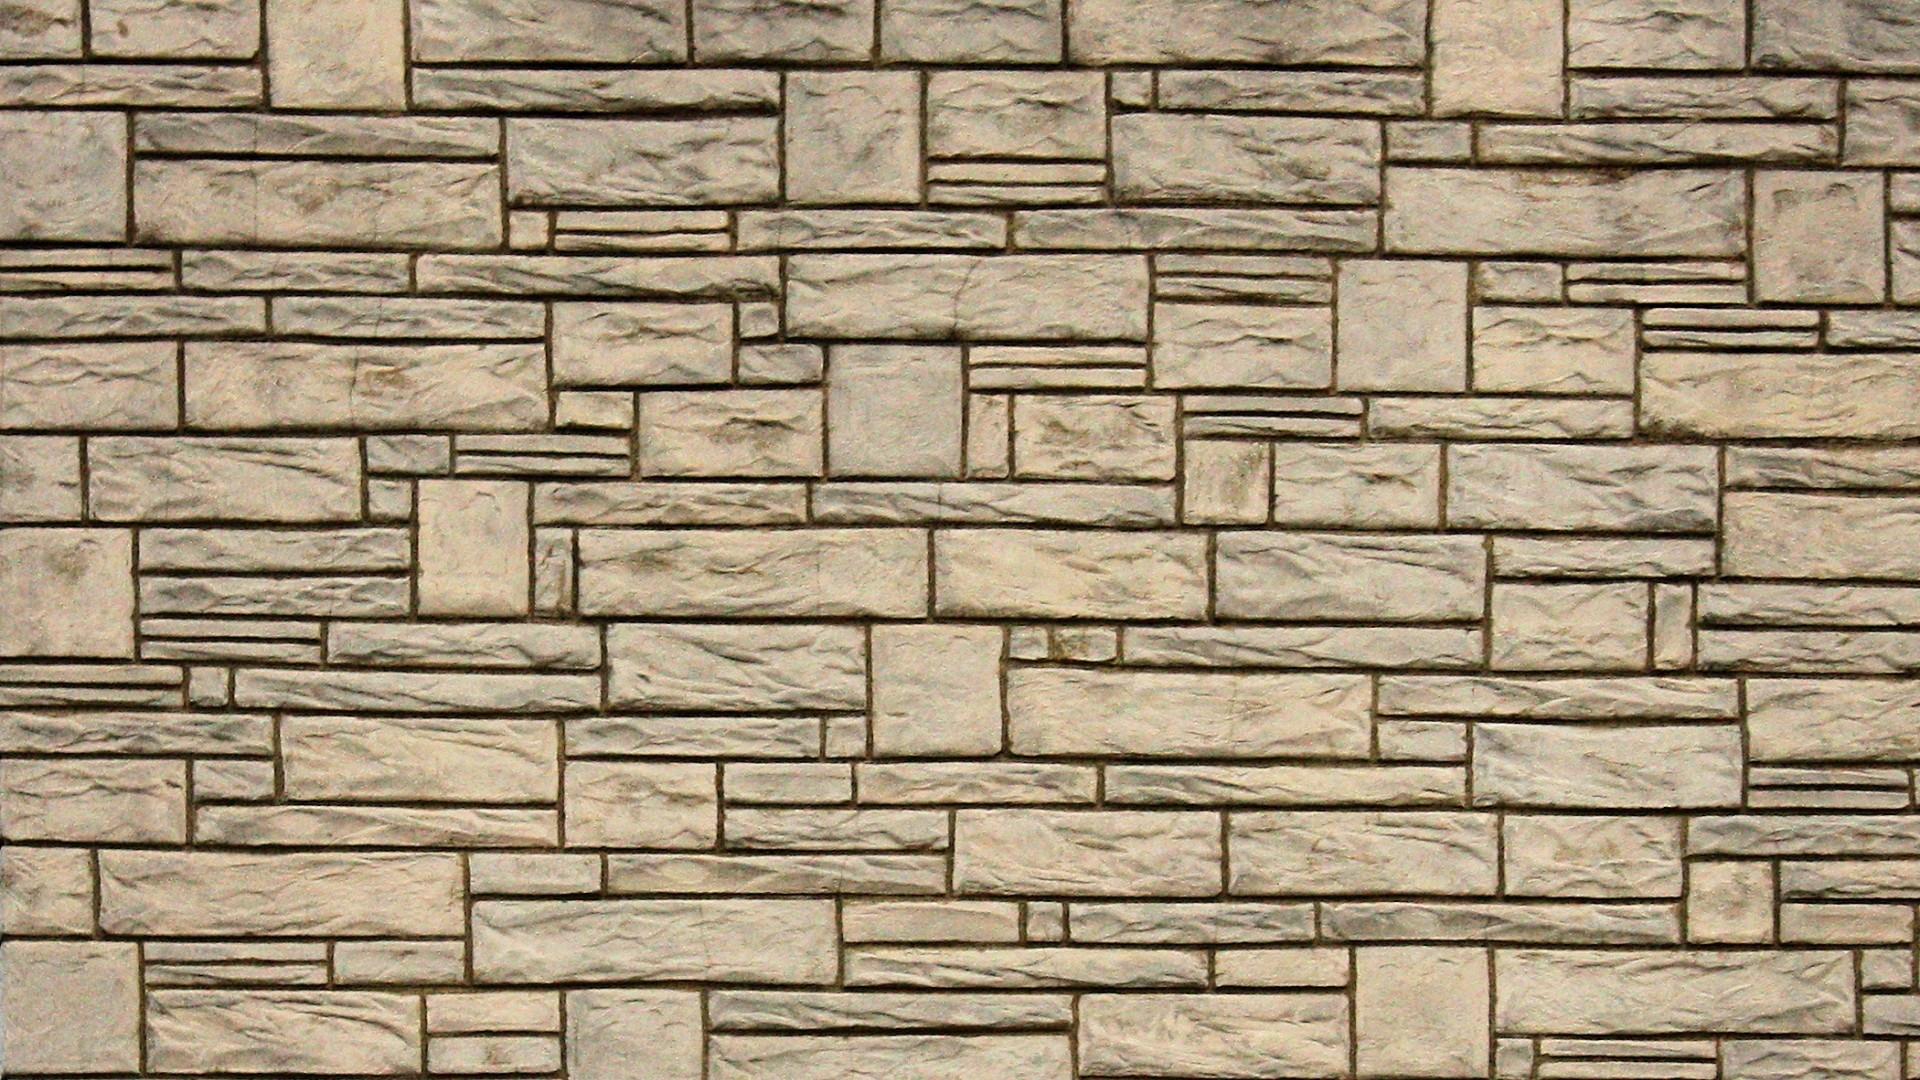 Texture Stone Desktop Wallpaper